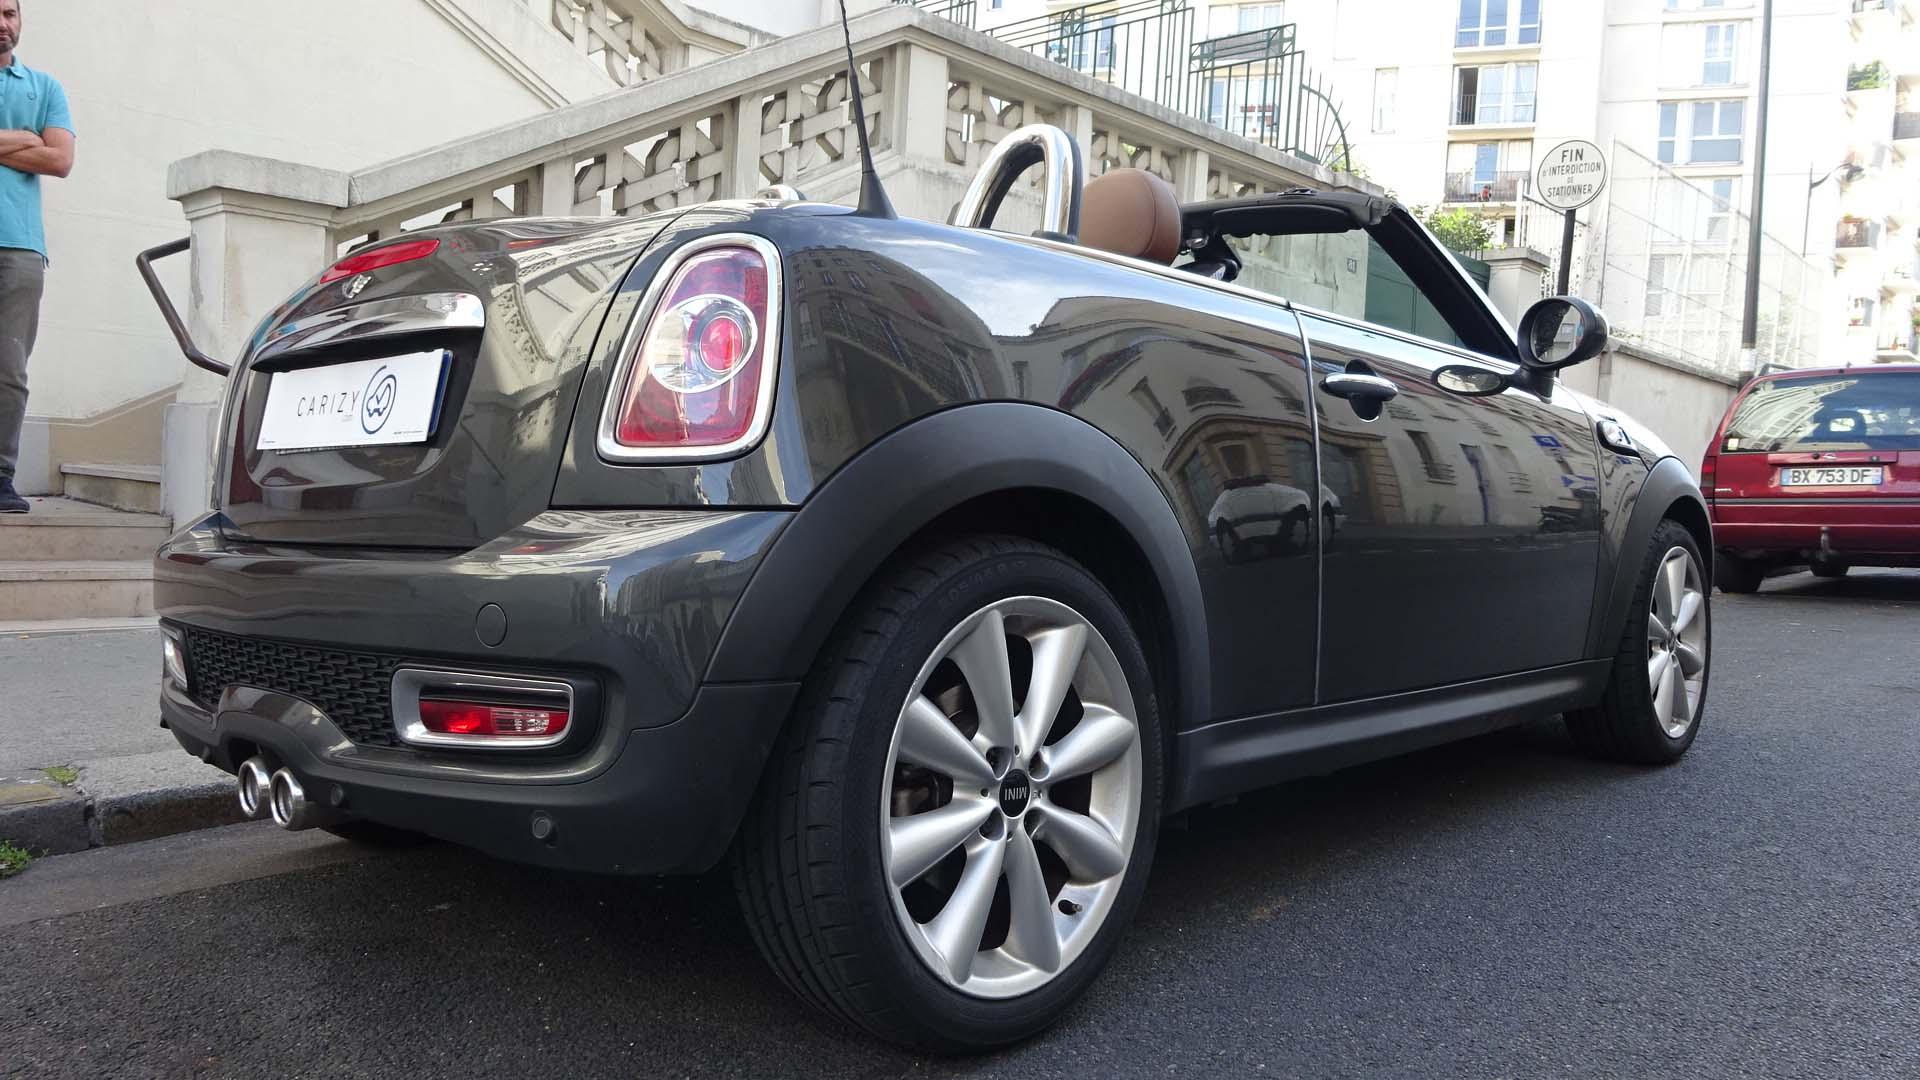 voiture occasion mini cabriolet labellis e vendre paris ref 593. Black Bedroom Furniture Sets. Home Design Ideas